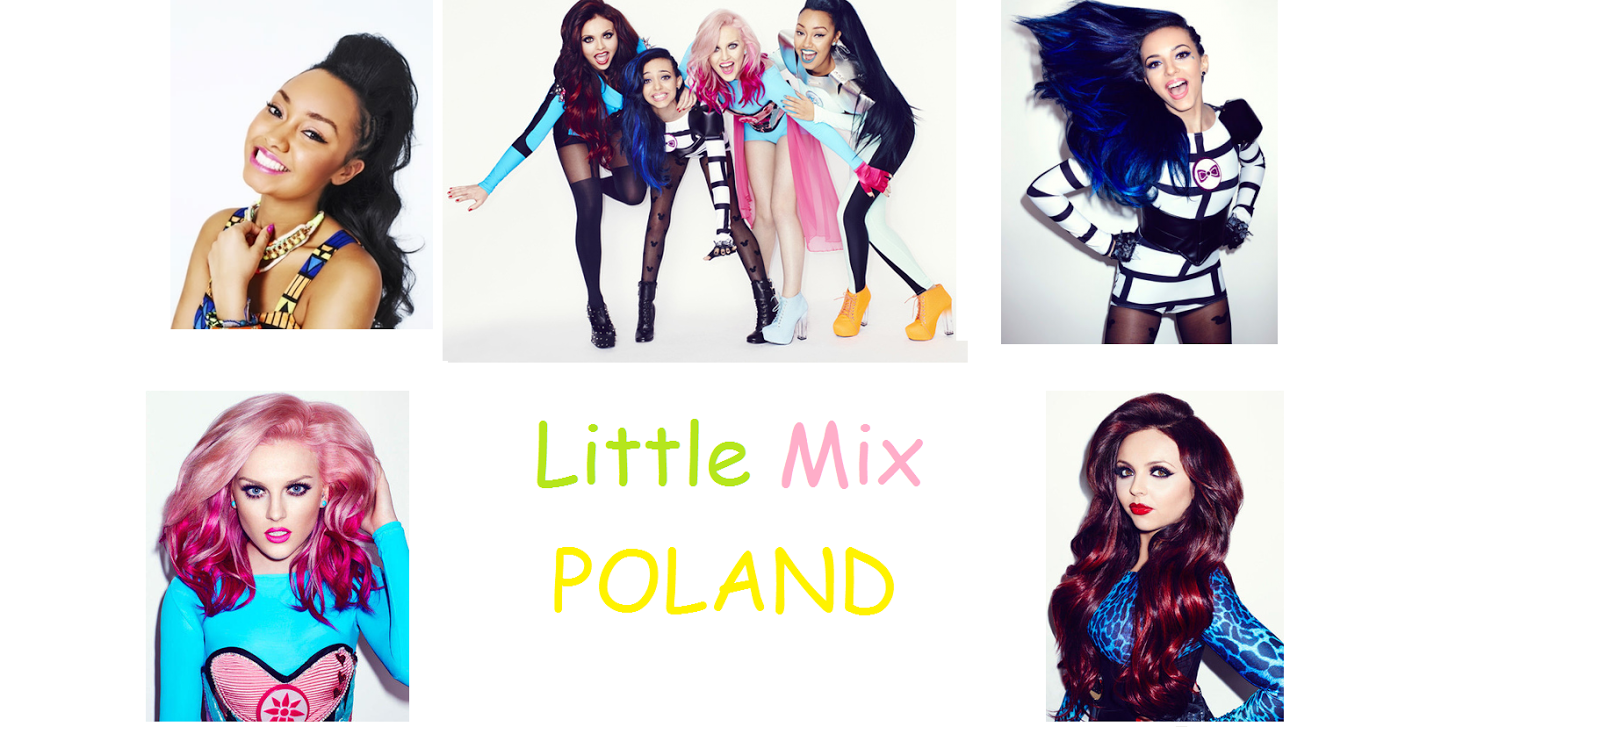 Oficjalny Polski blog o Little Mix